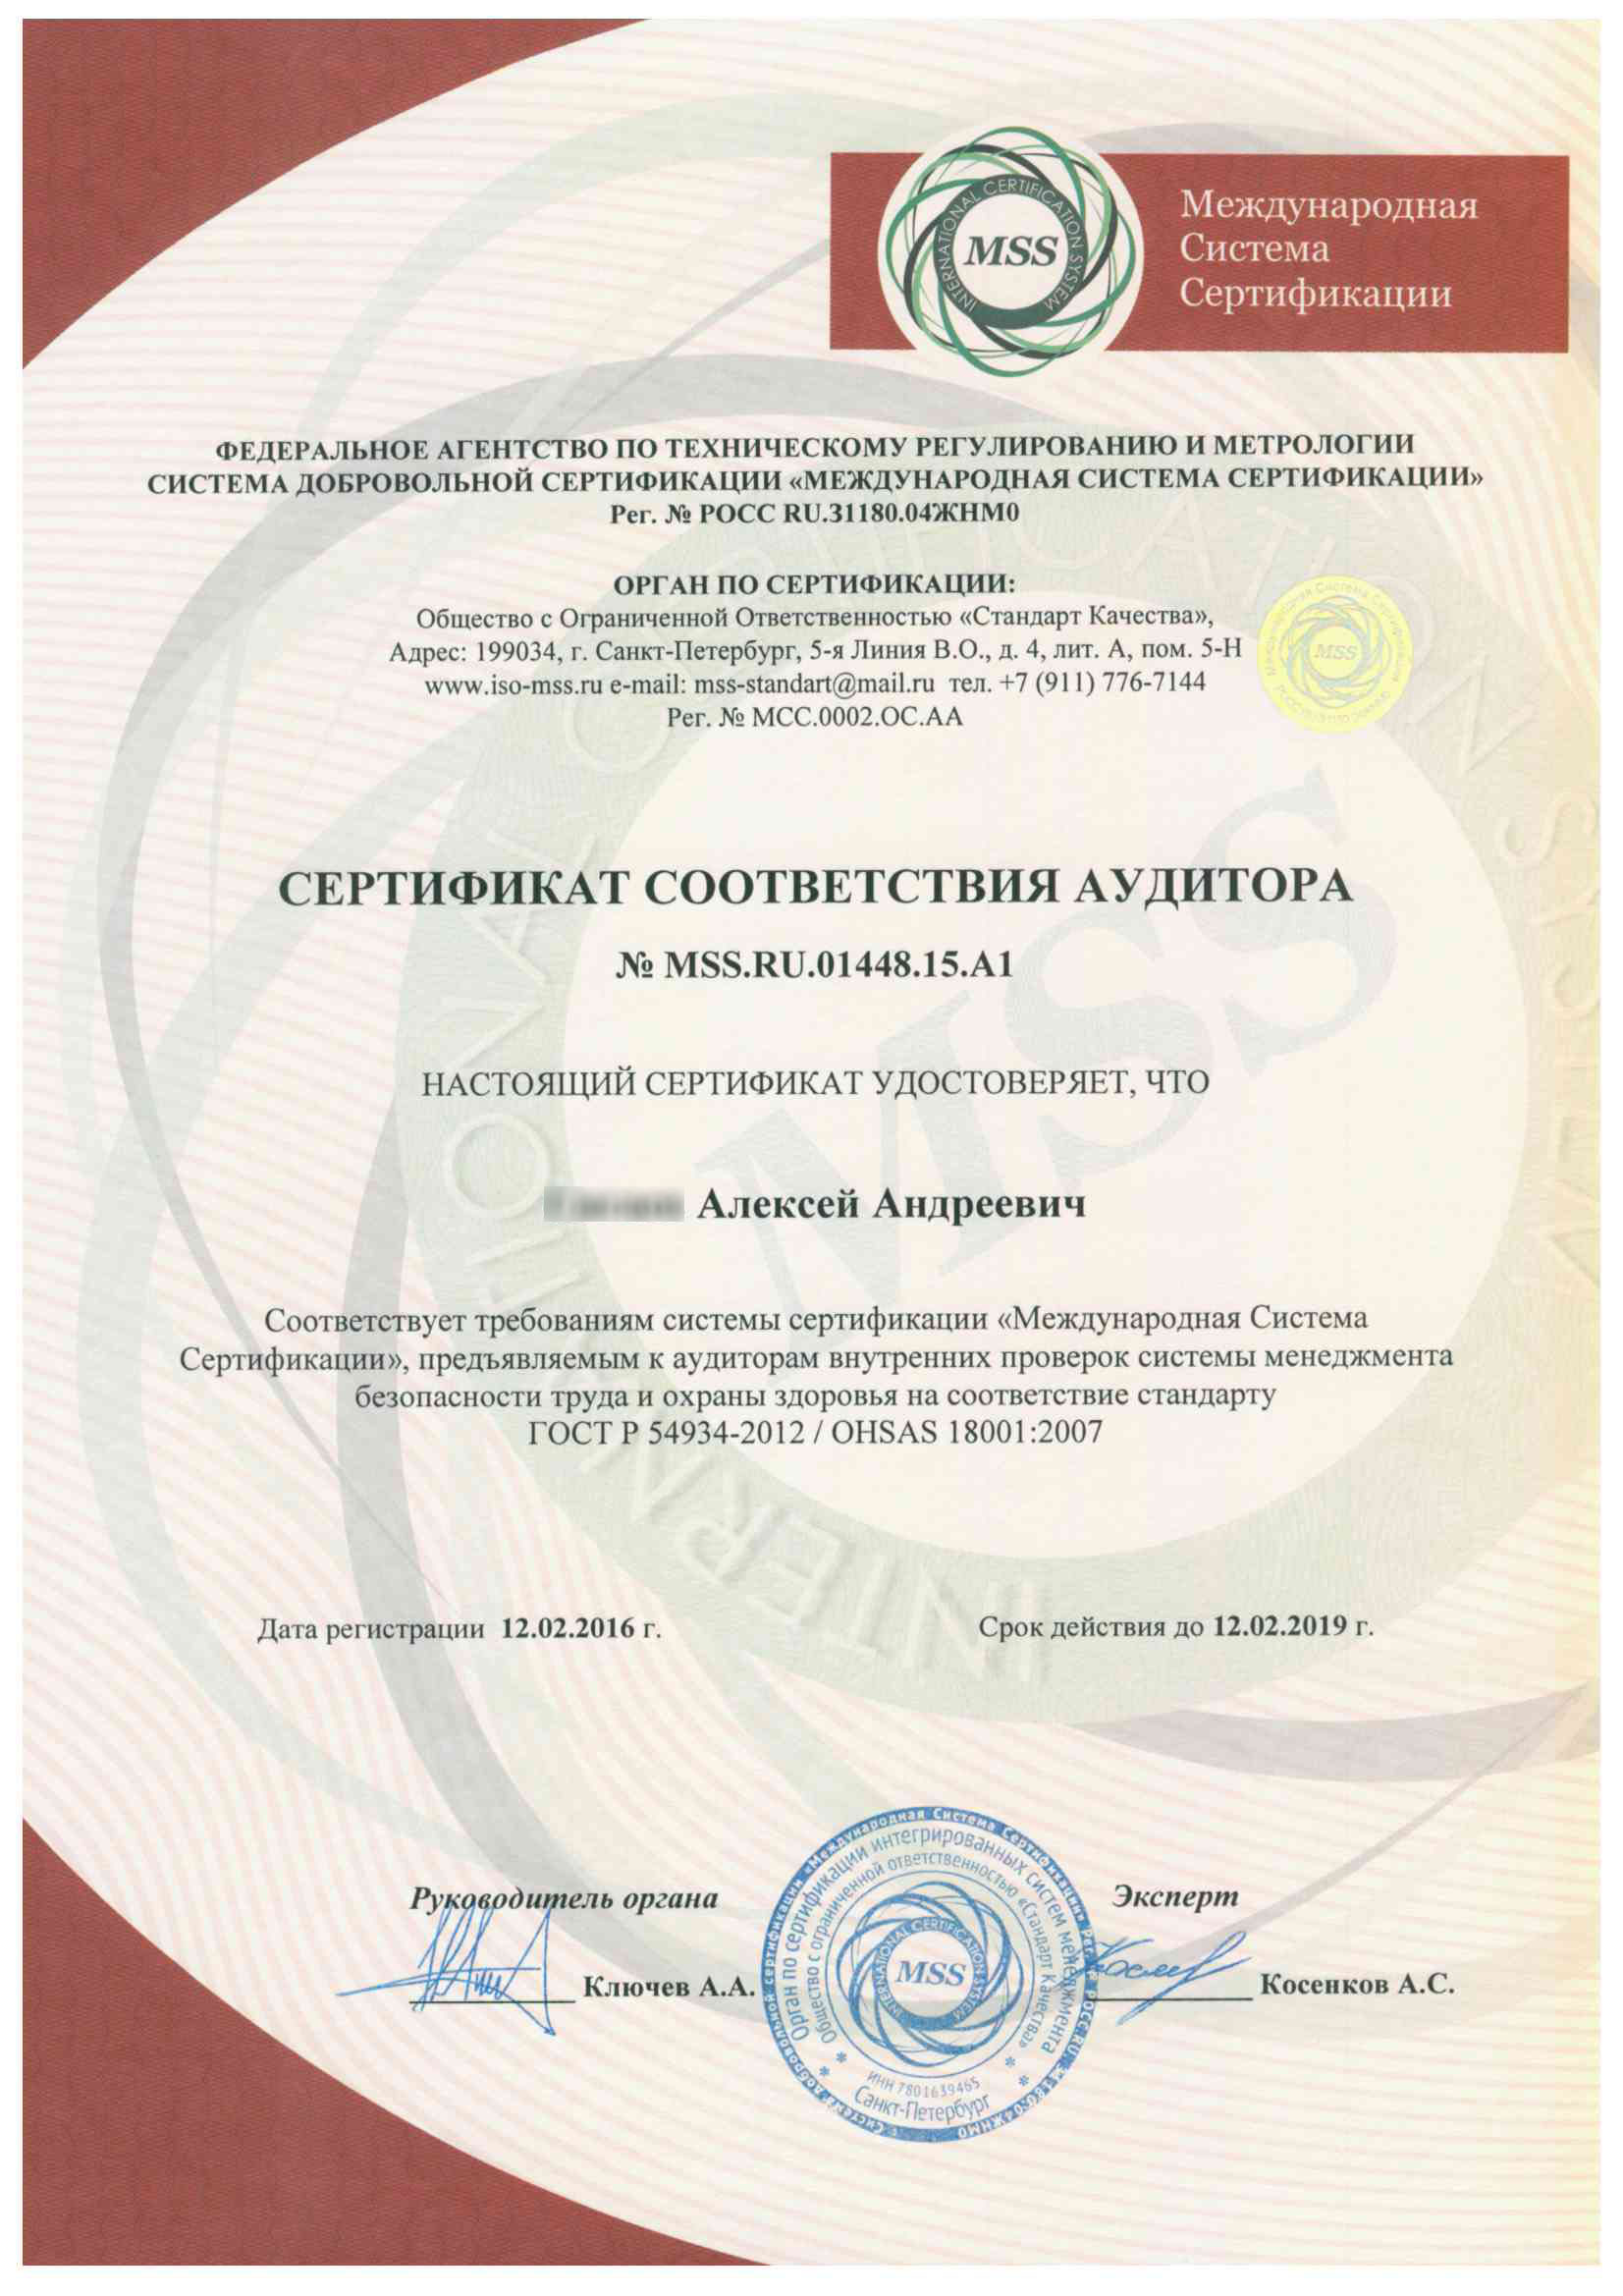 Sertifikası ohsas 18001:2007